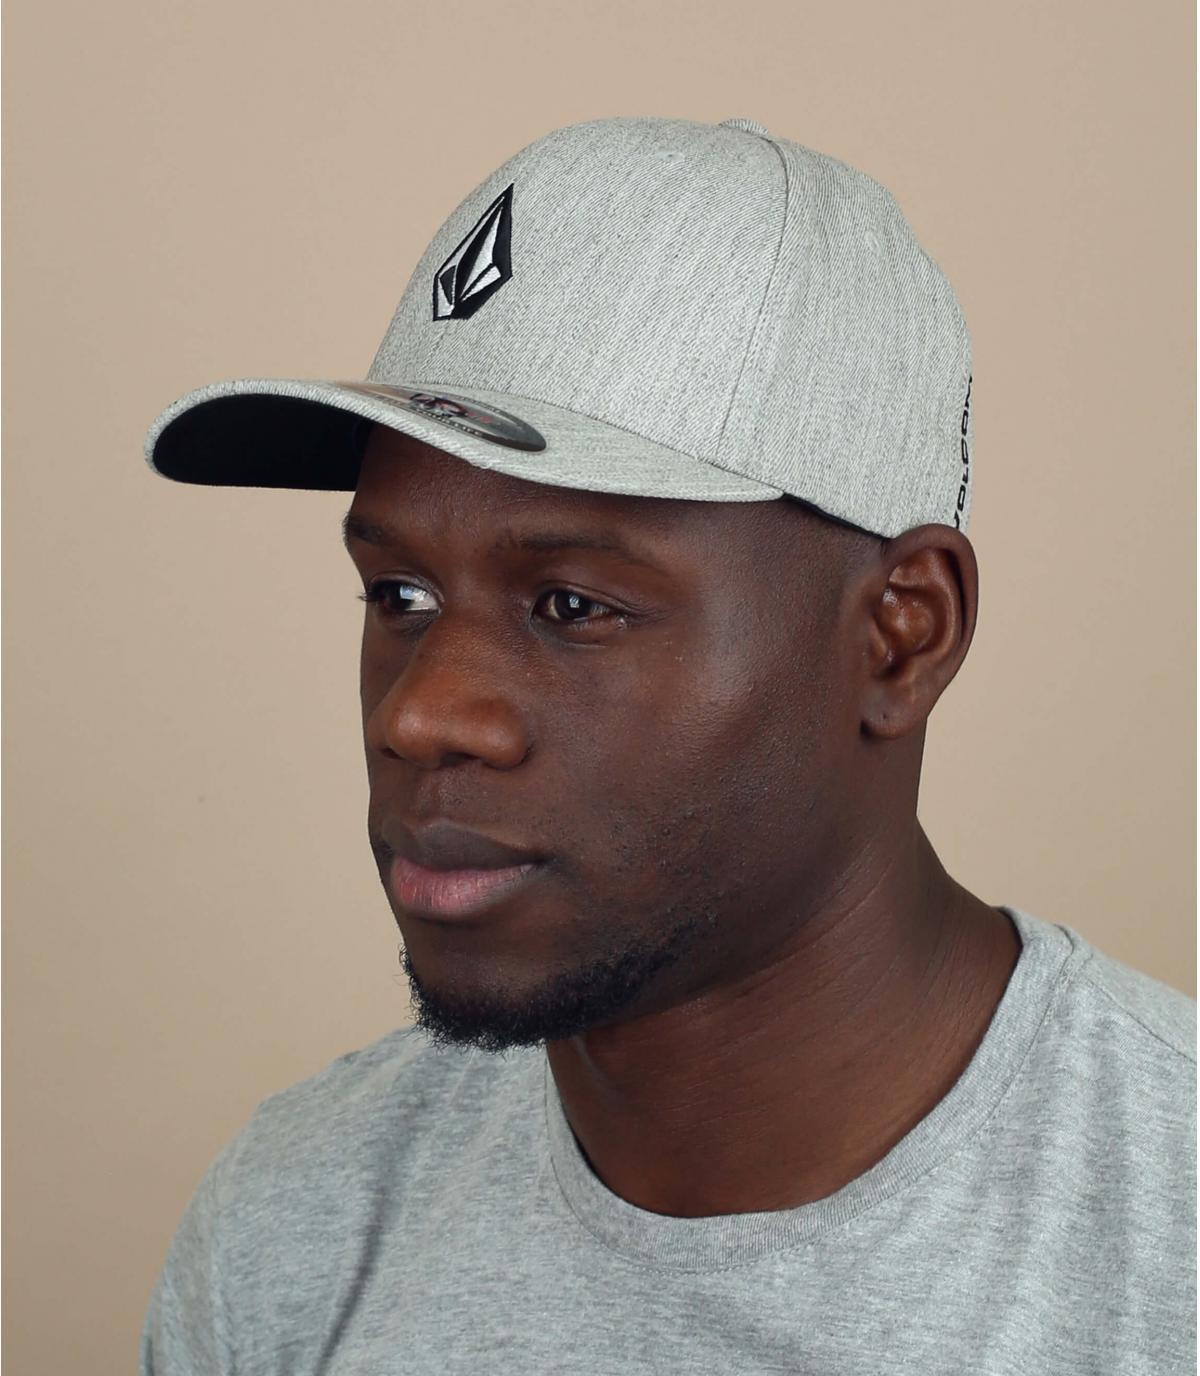 cappellino Volcom grigio chiné